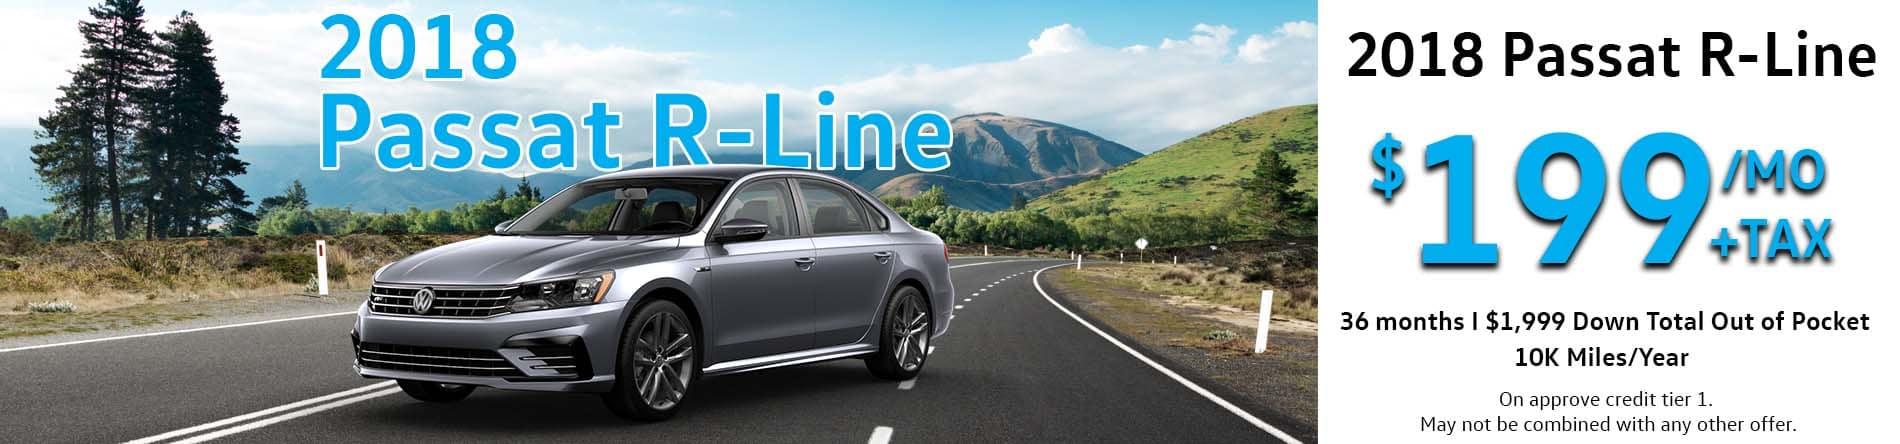 2018 Passat R-Line Homepage Slide